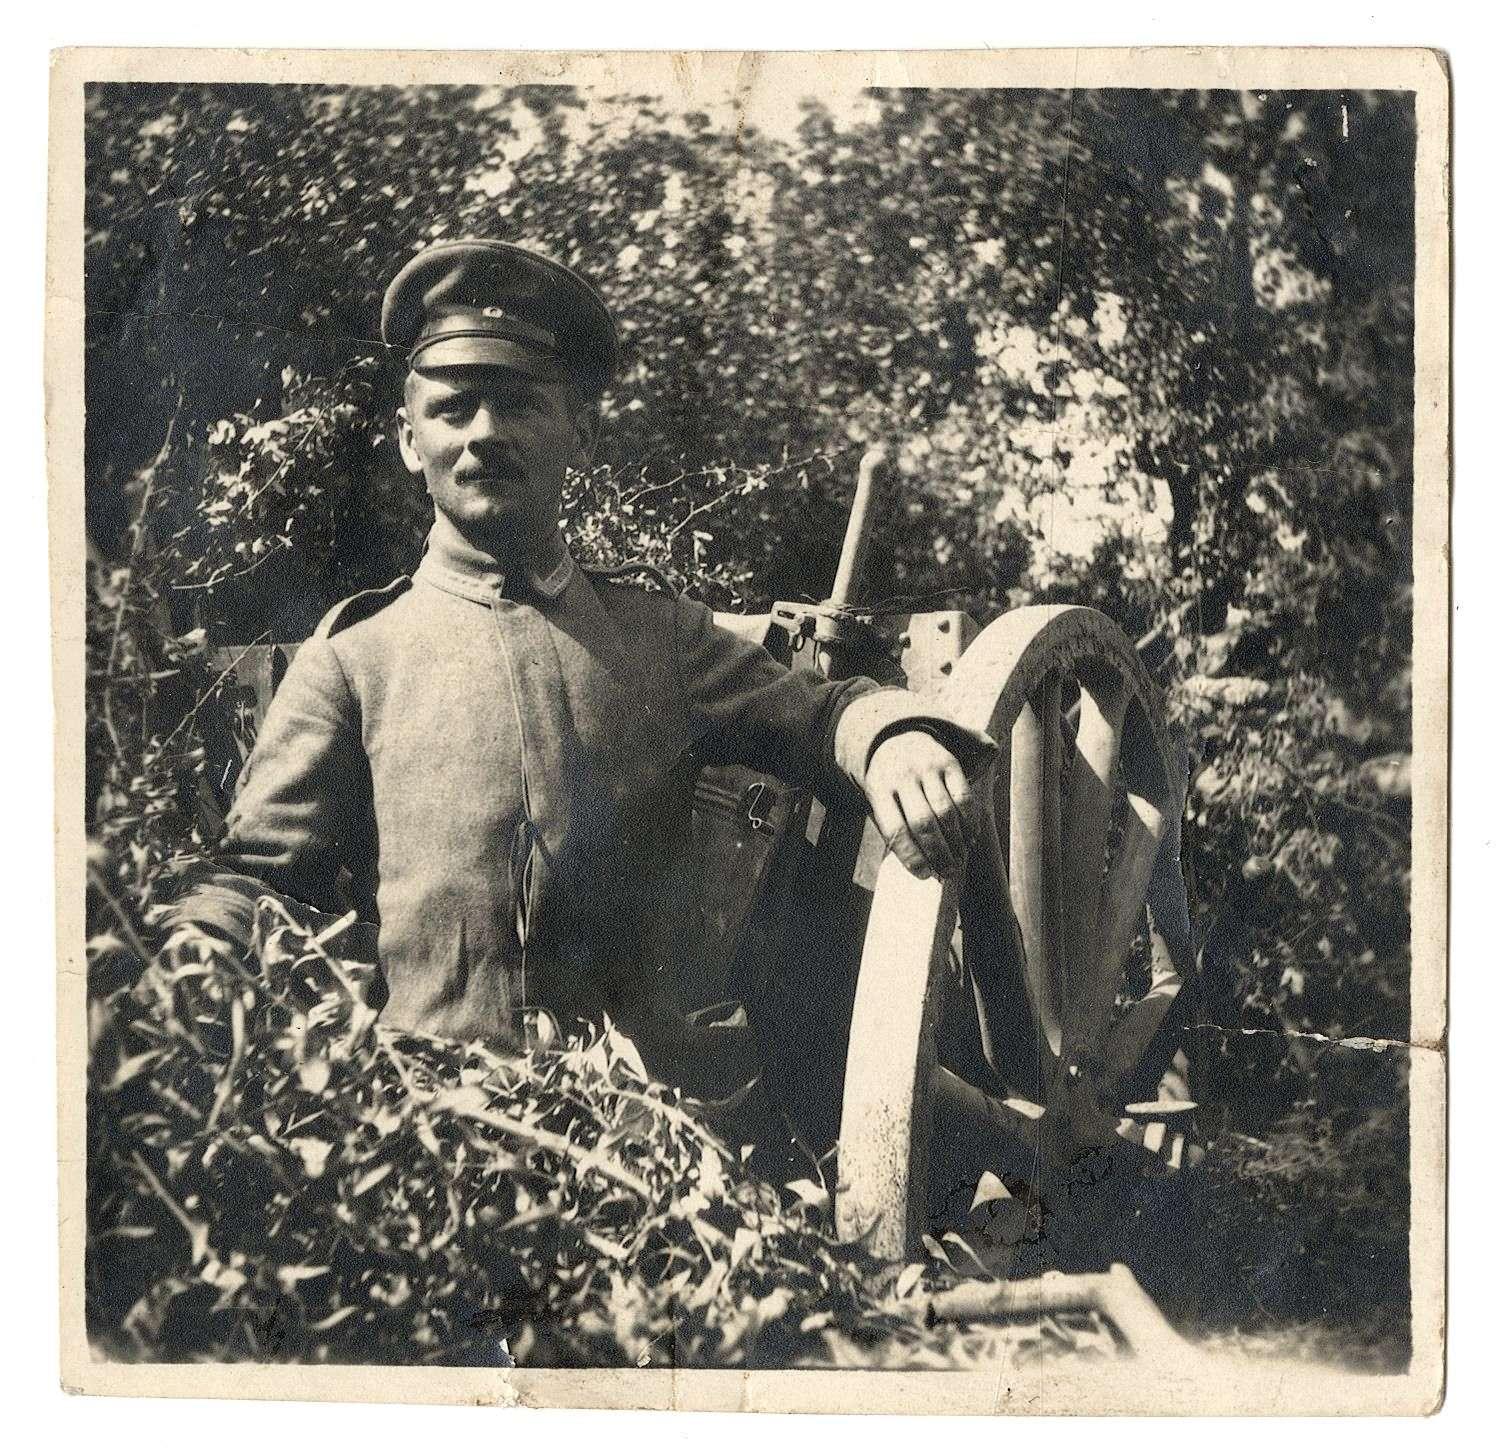 Bässler, Rudolf, Bild 2